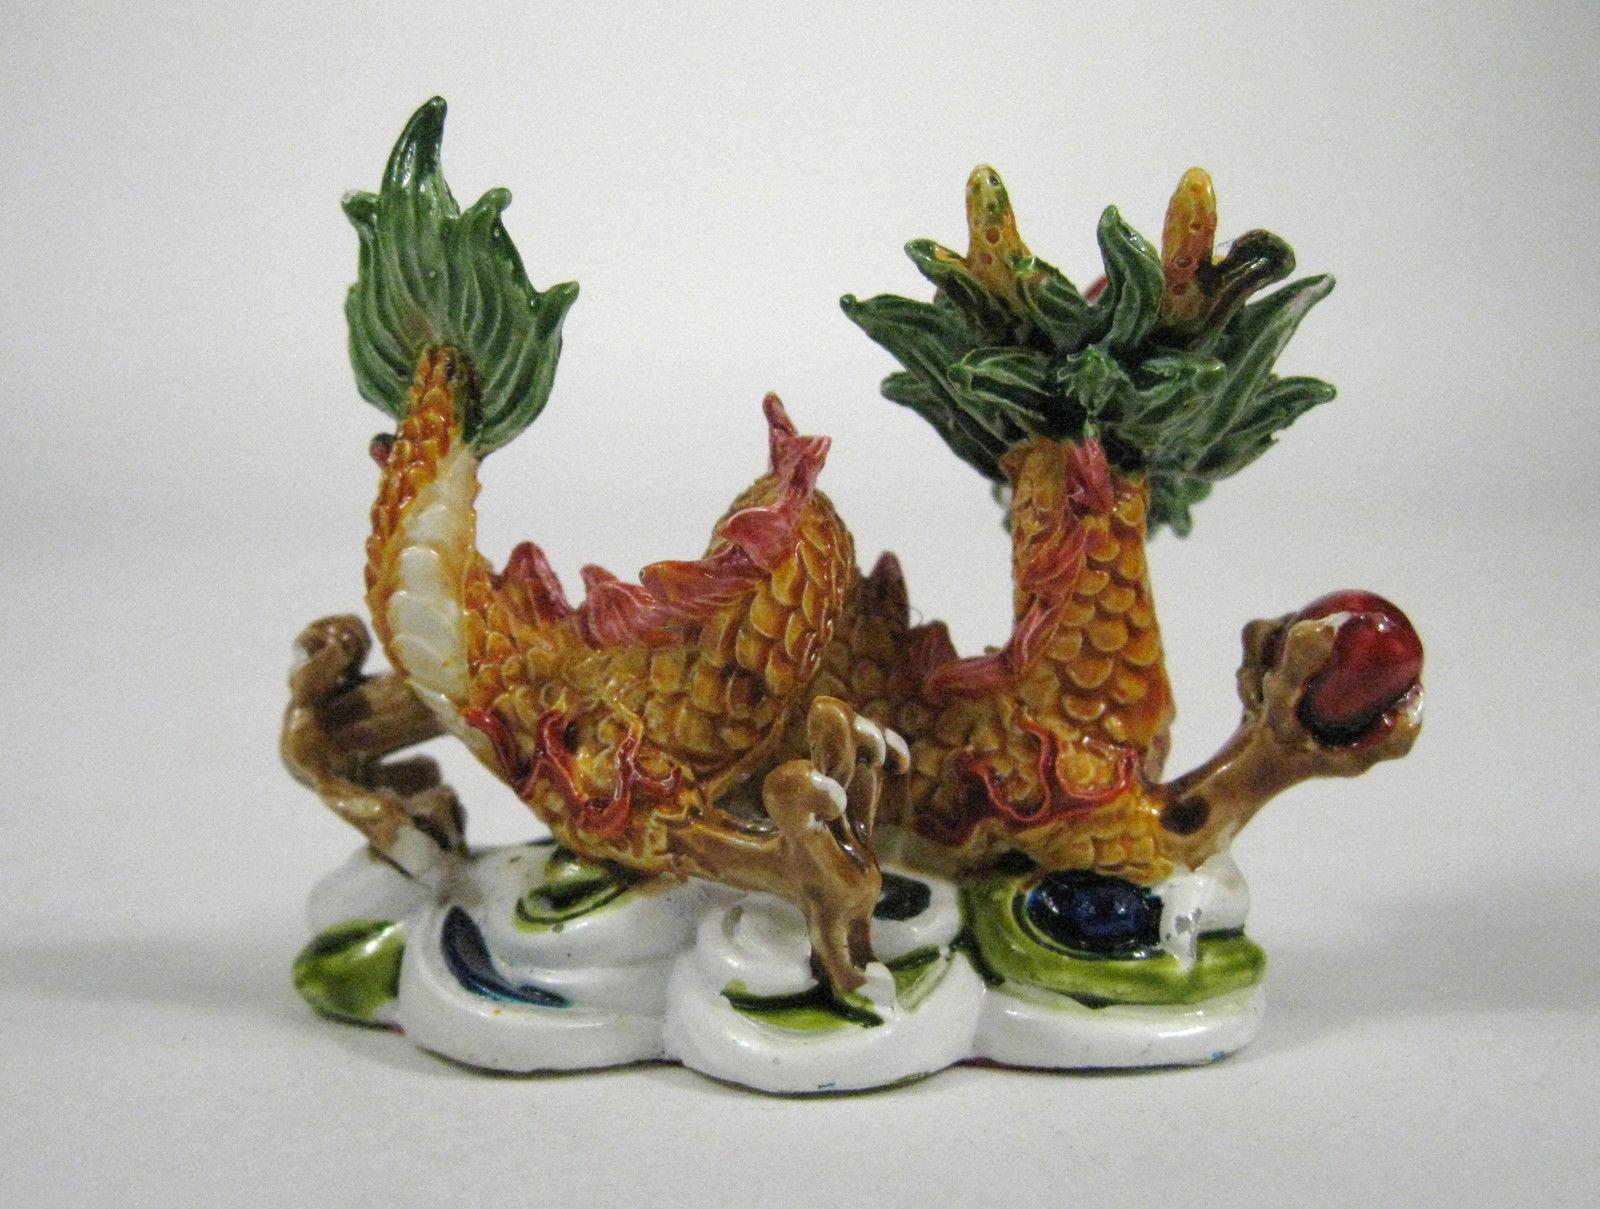 Dragon Figurine Sculpture Asian Ceramic Pottery Size 2 Inch Glazed Statue